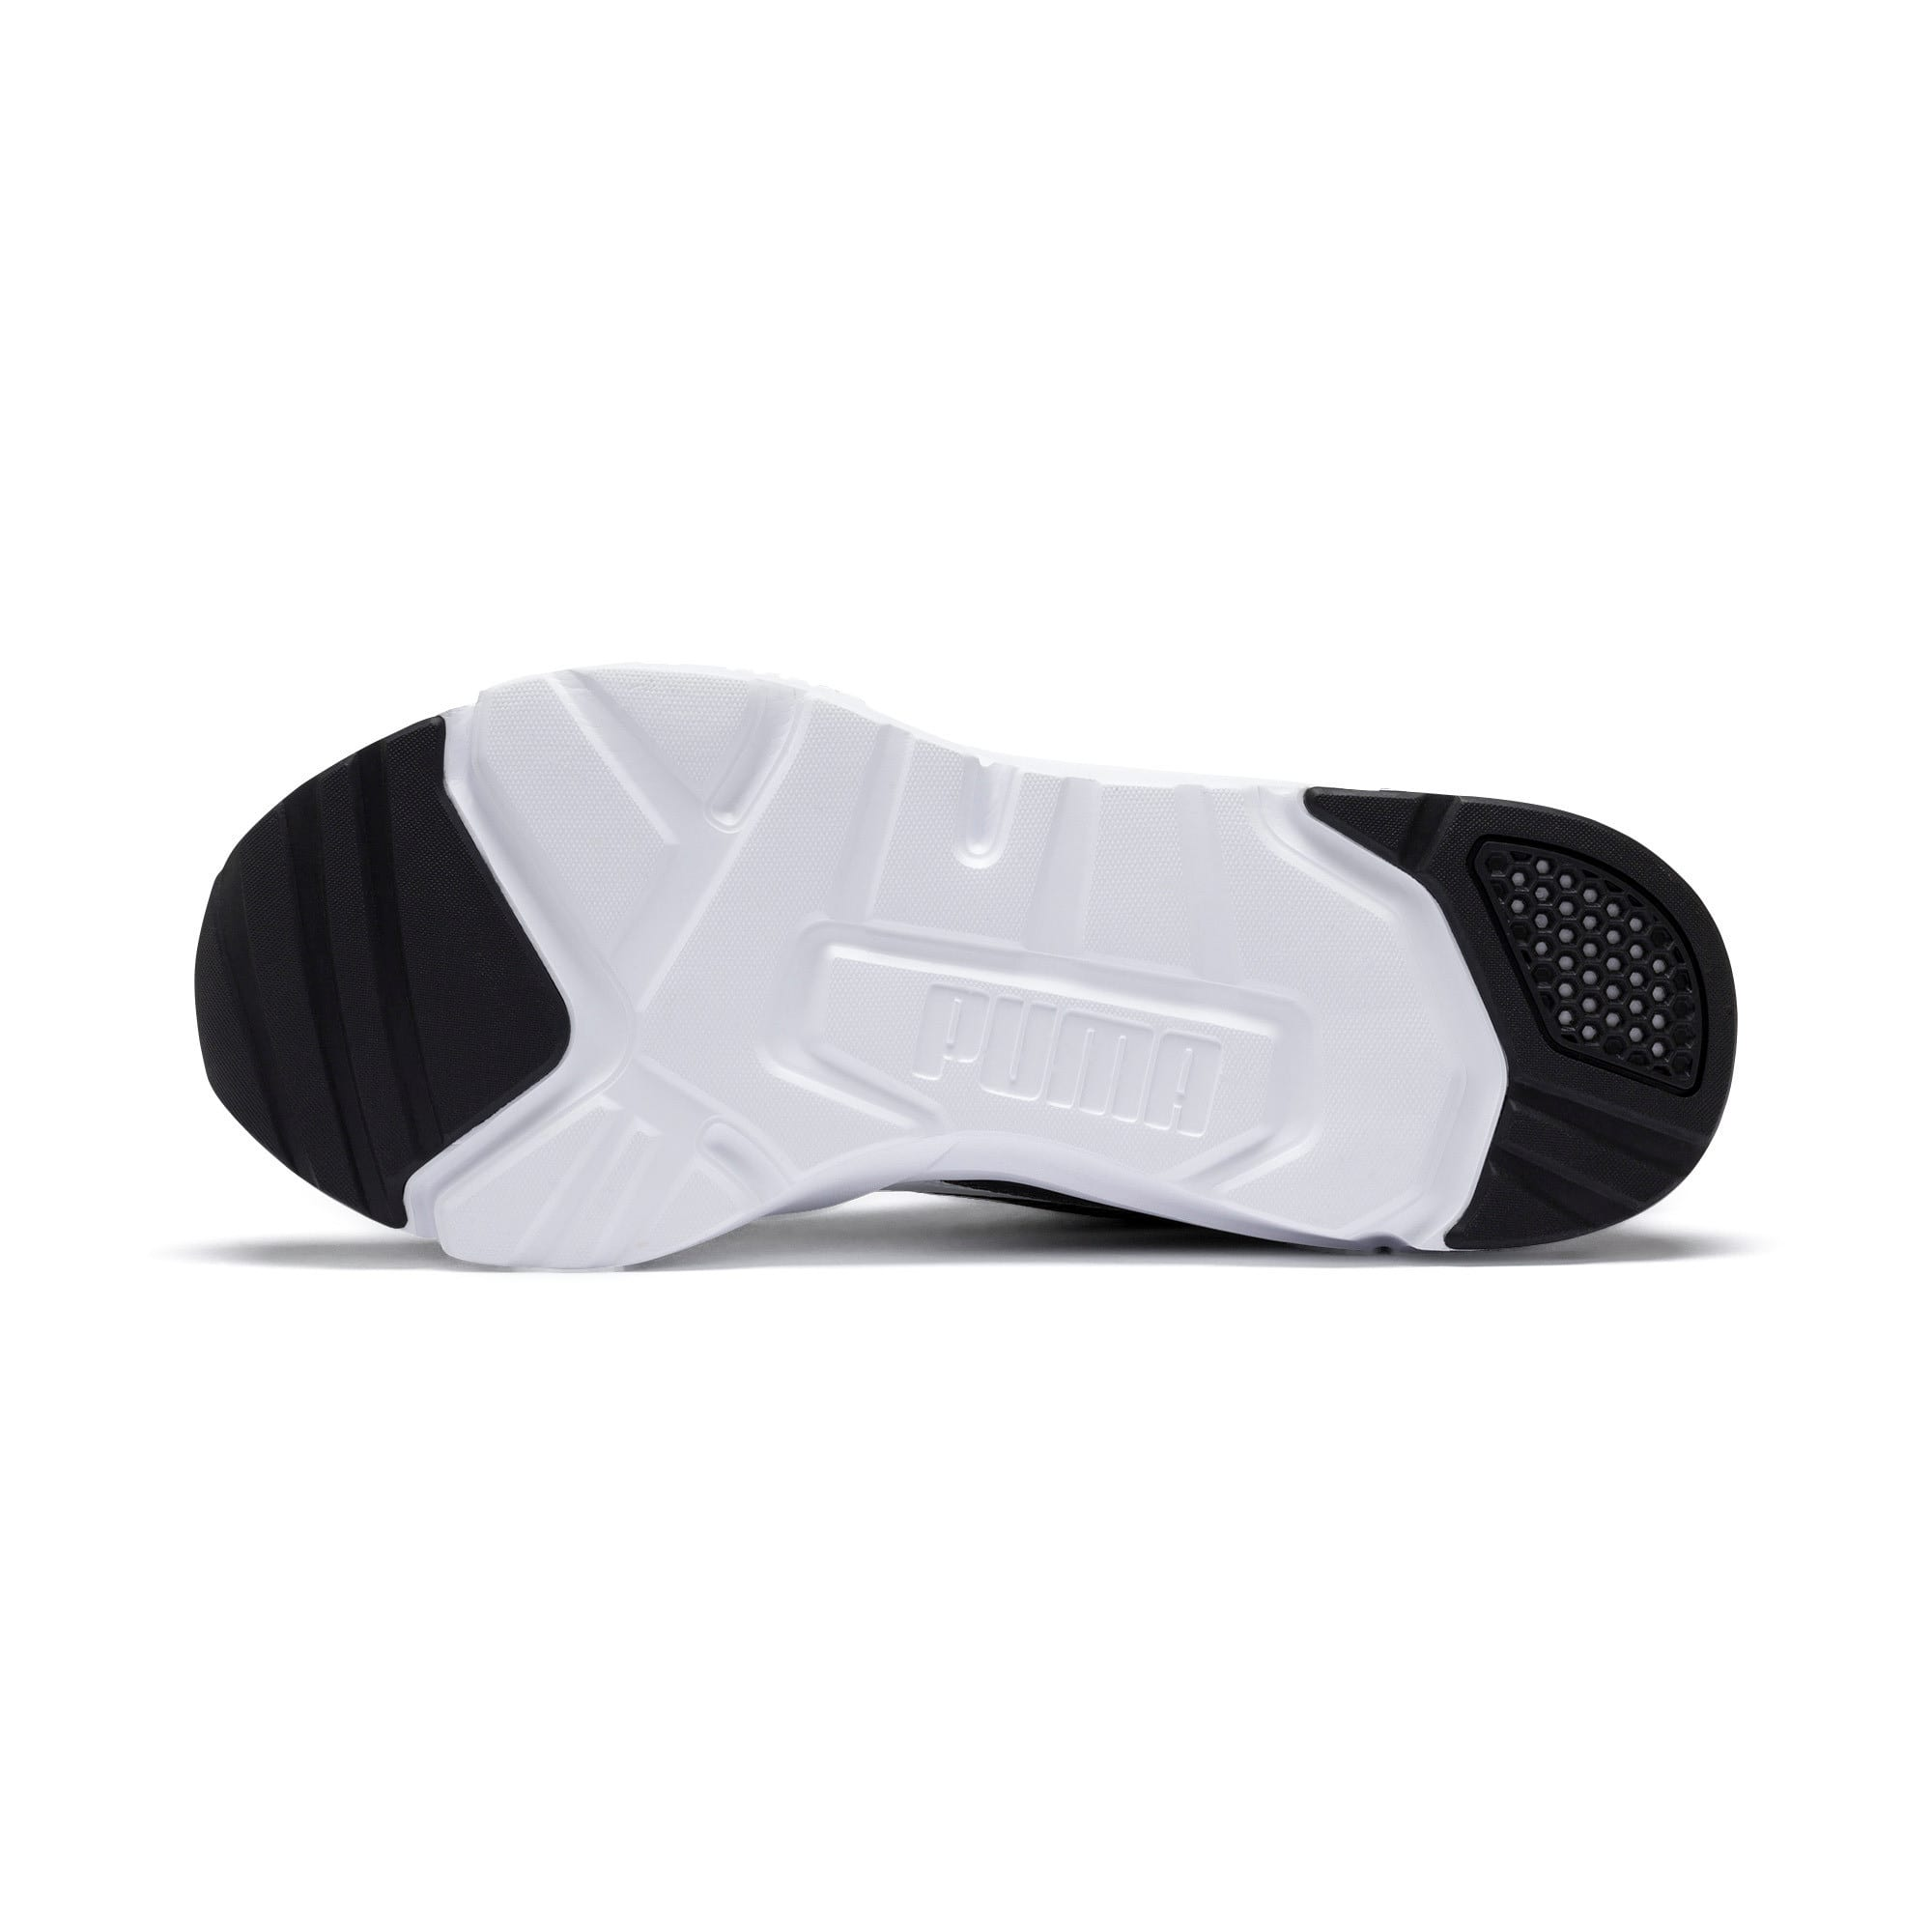 Thumbnail 5 of CELL Phase Men's Training Shoes, Puma Black-Puma White, medium